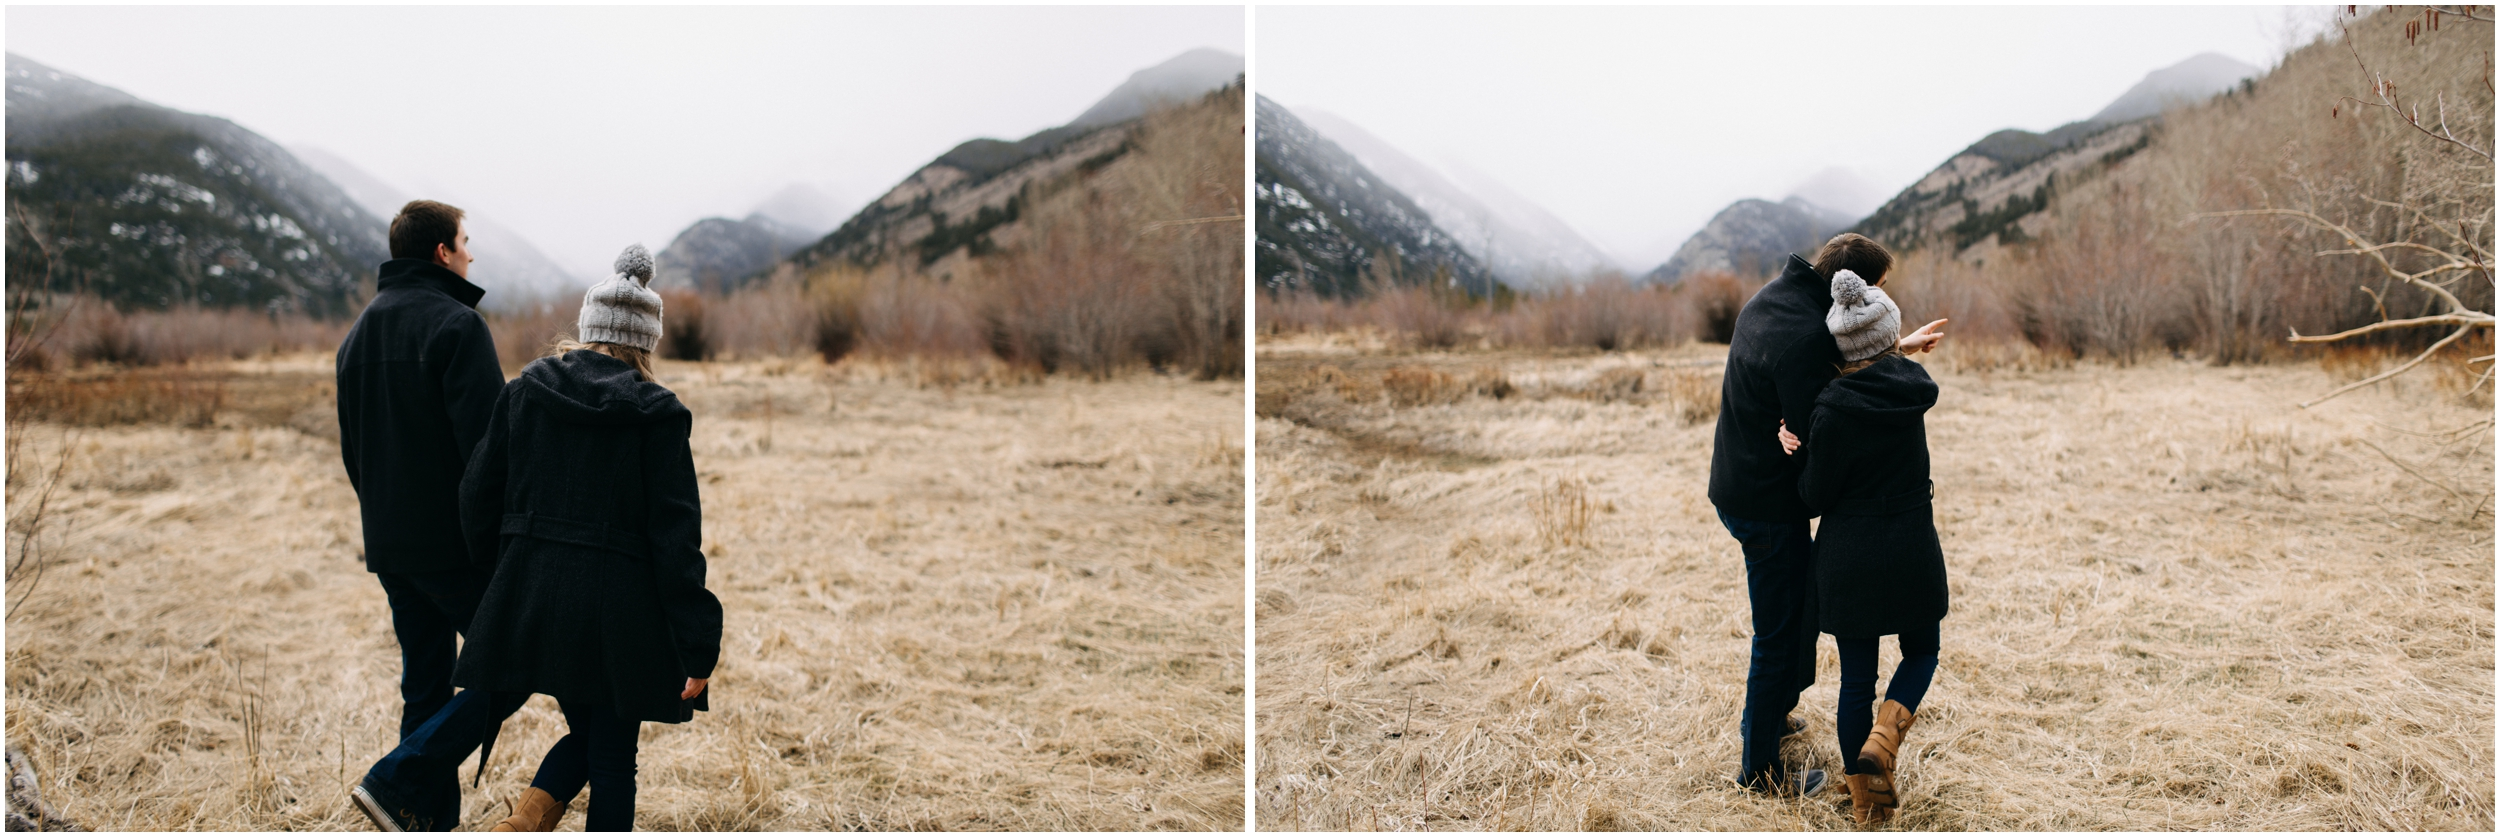 rocky-mountain-national-park-engagement-session-colorado-wedding-photographer-endo-valley__0071.jpg